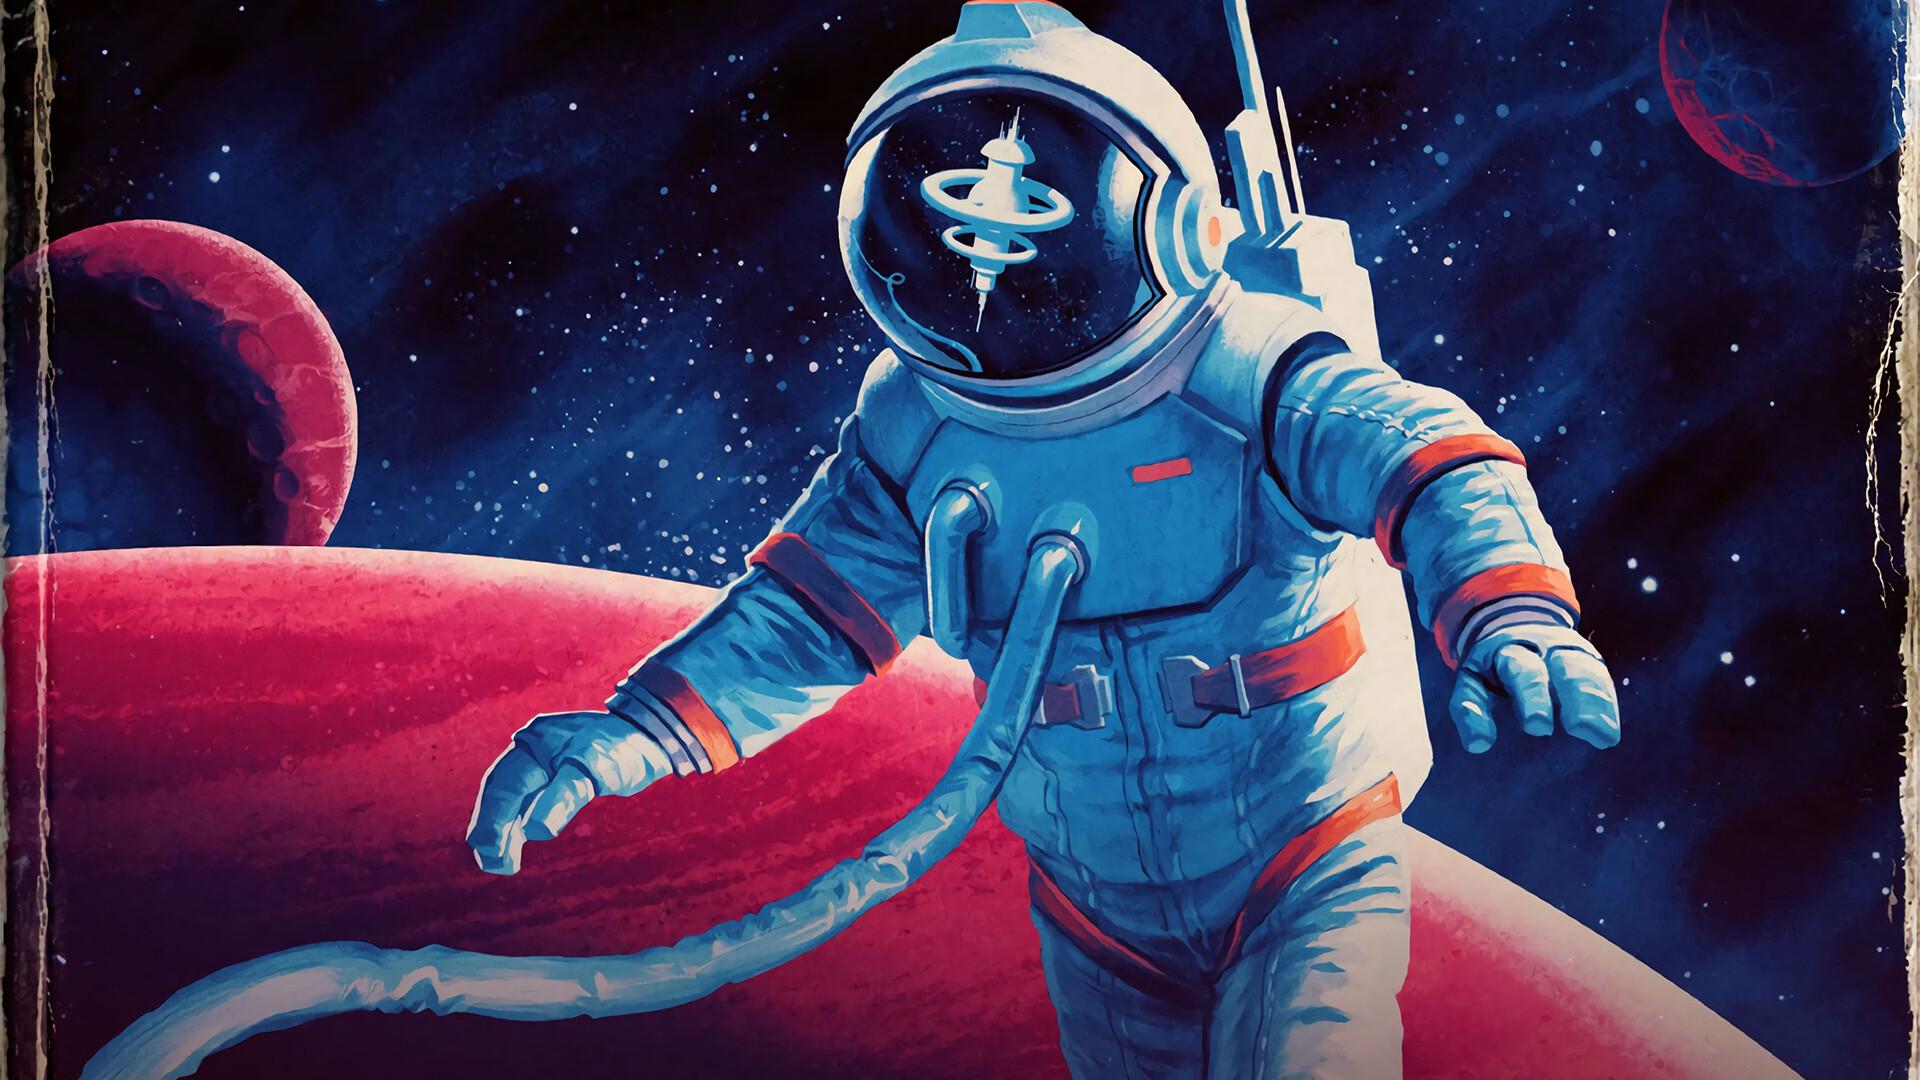 Steam Summer Sale Space 1080p wallpaper